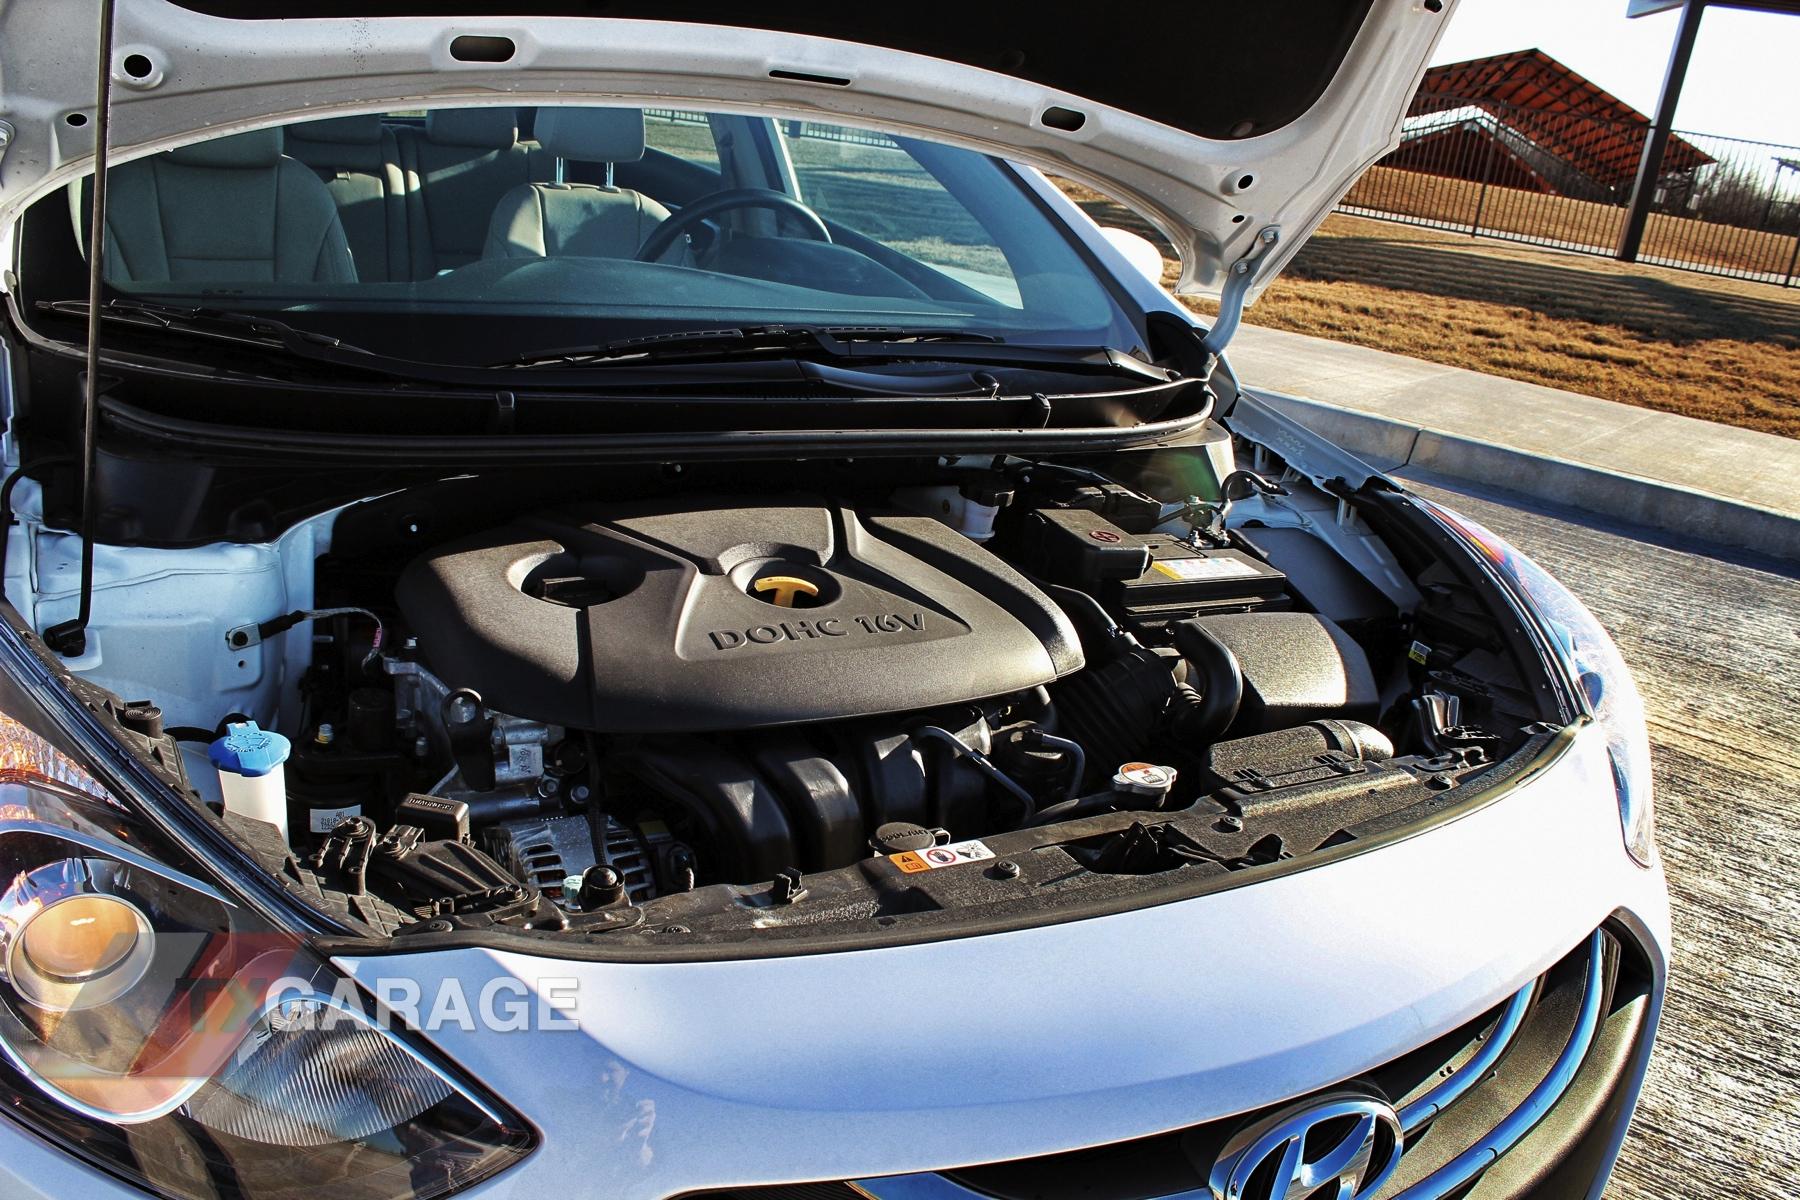 2013 Hyundai Elantra Gt 047 Txgarage